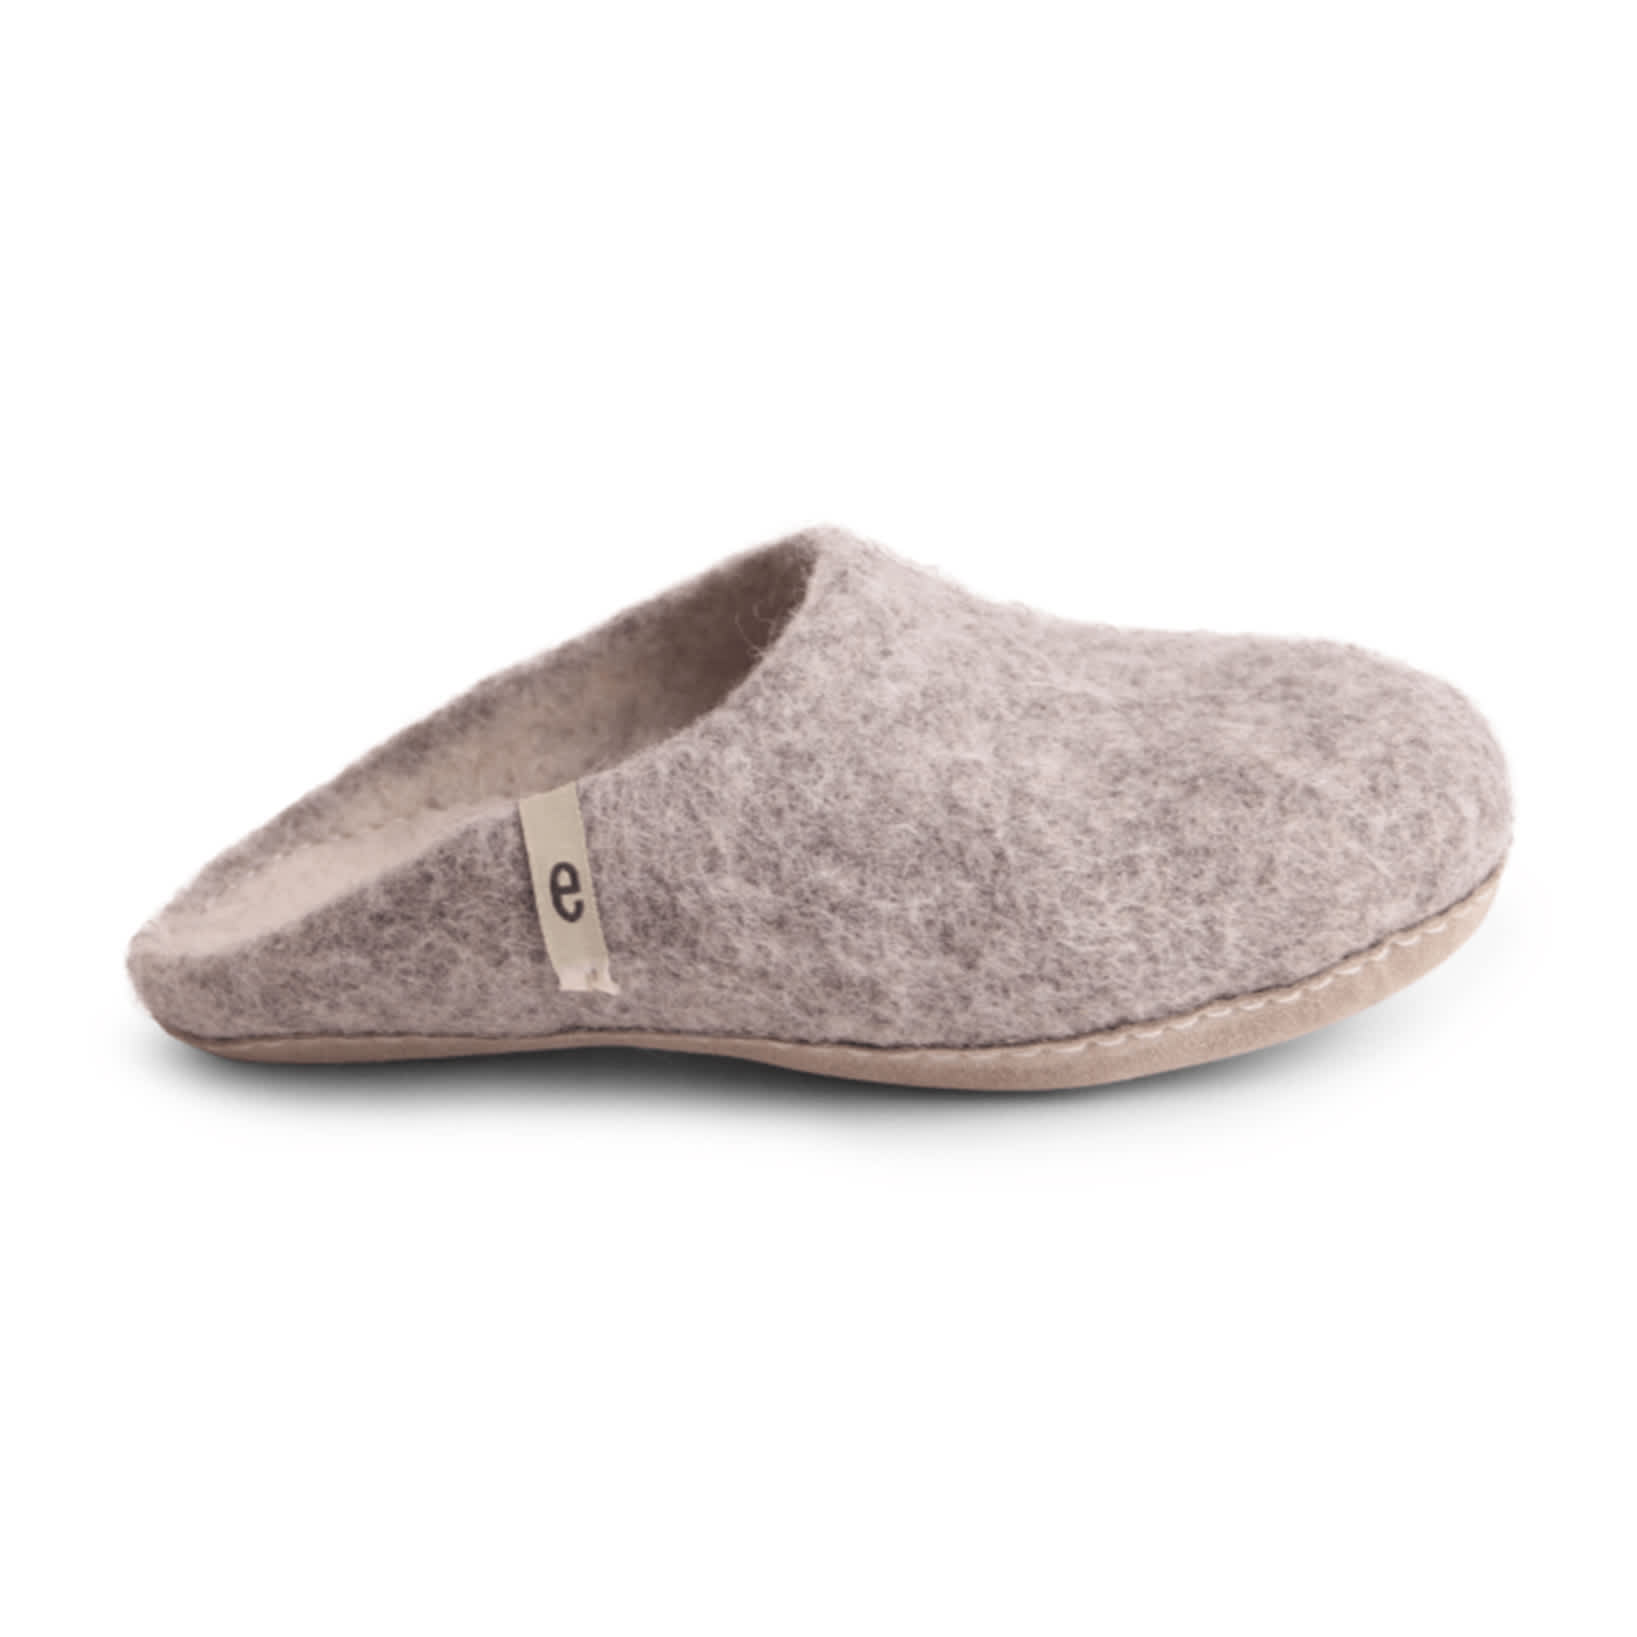 Men's Wool Slippers - Grey